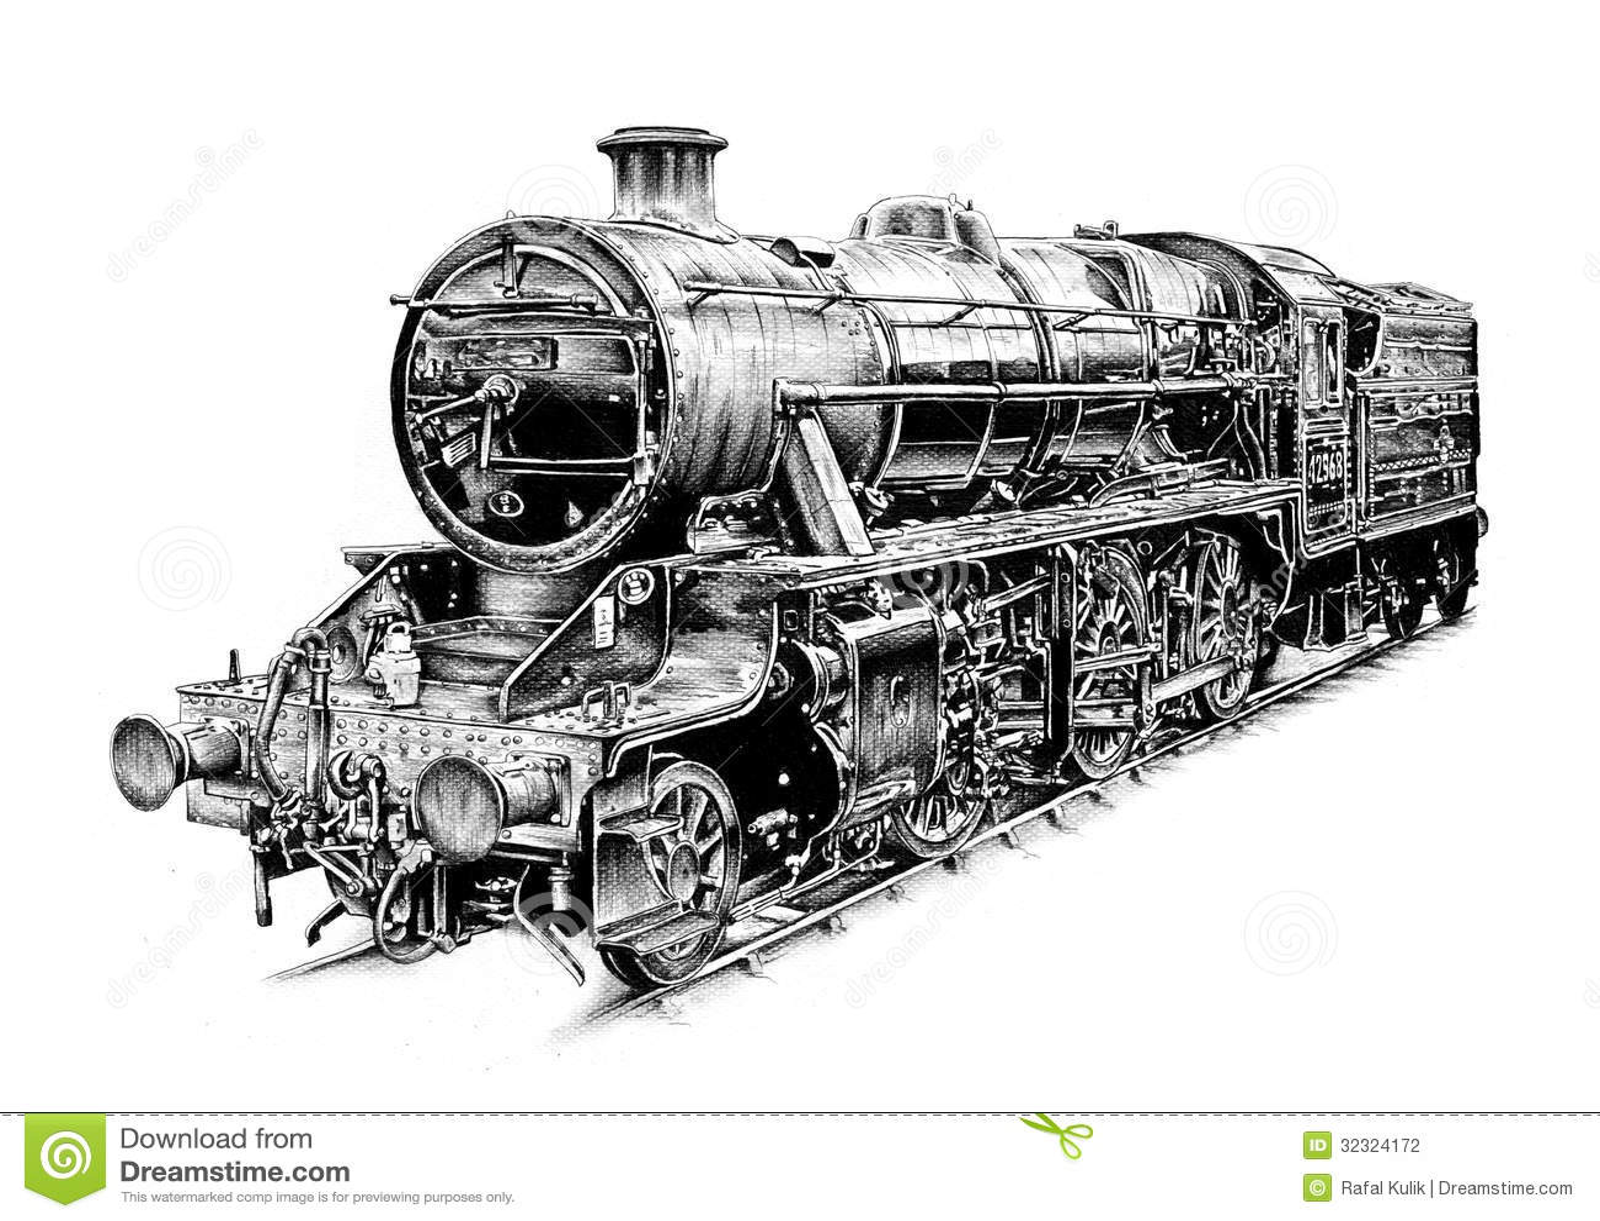 Art Design Drawing : Steam engine art design drawing stock illustration